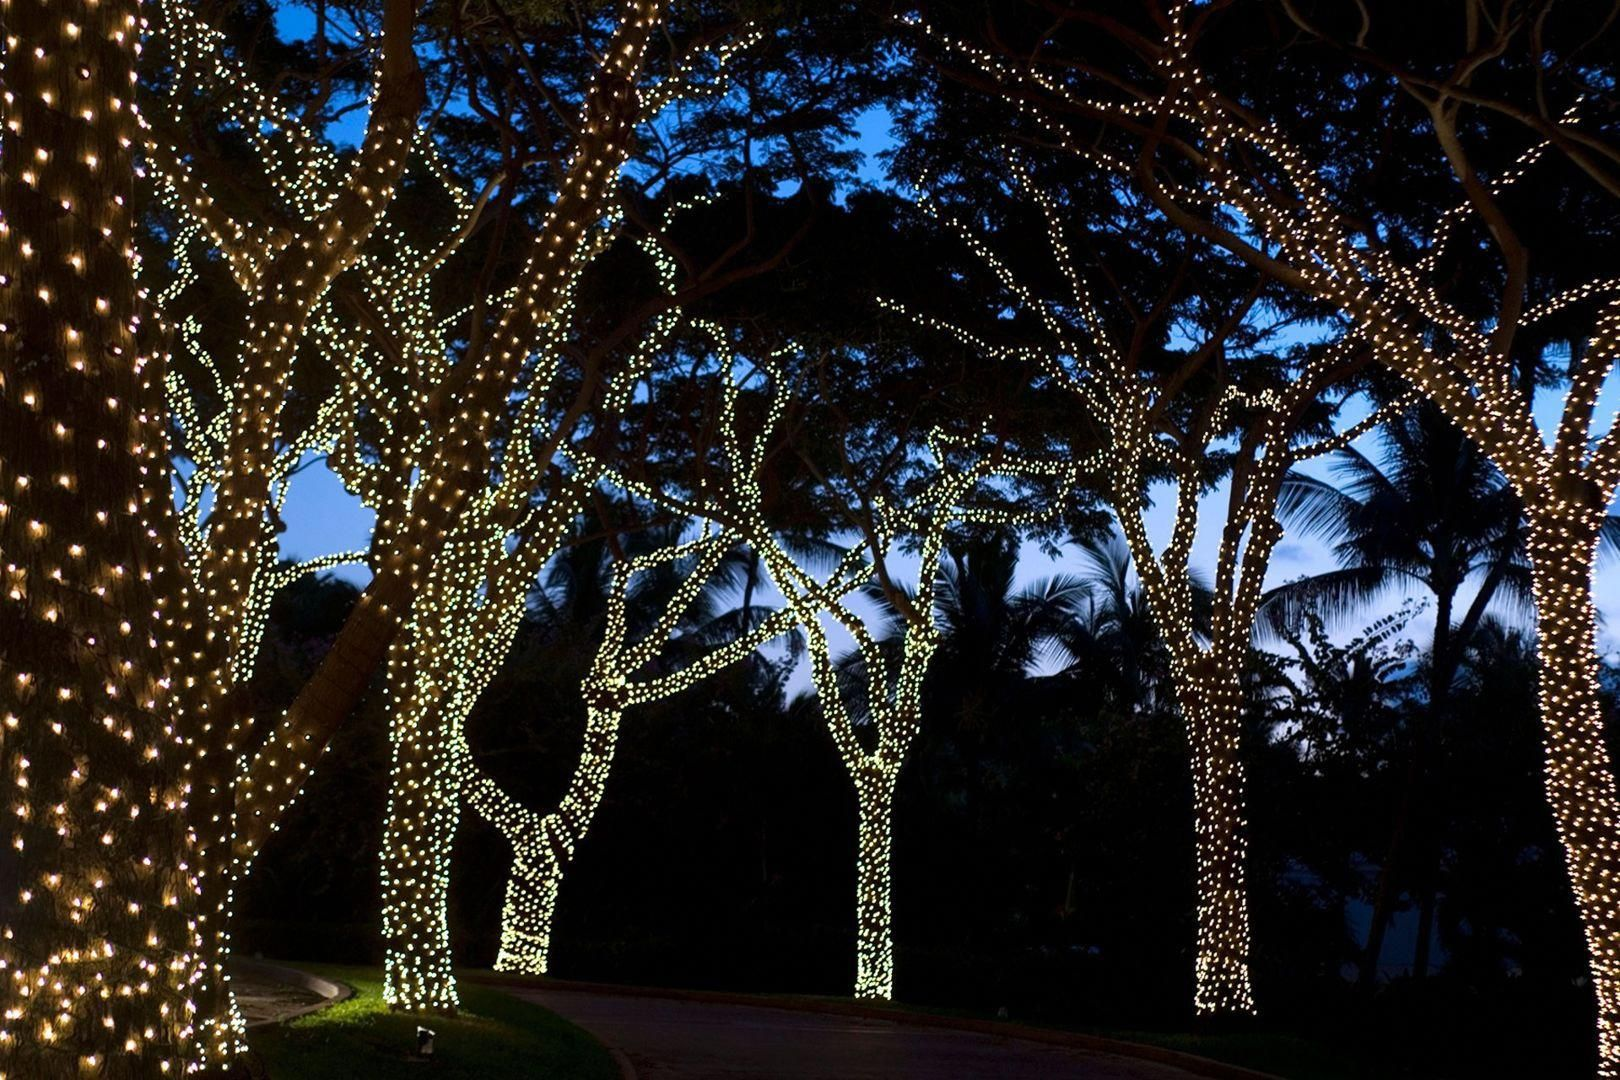 Best Diy Outdoor Lighting Ideas For Your Garden Or Your Porch Backyard 9292123271 Outdoorli Outdoor Fairy Lights Fairy Lights In Trees Outdoor Tree Lighting